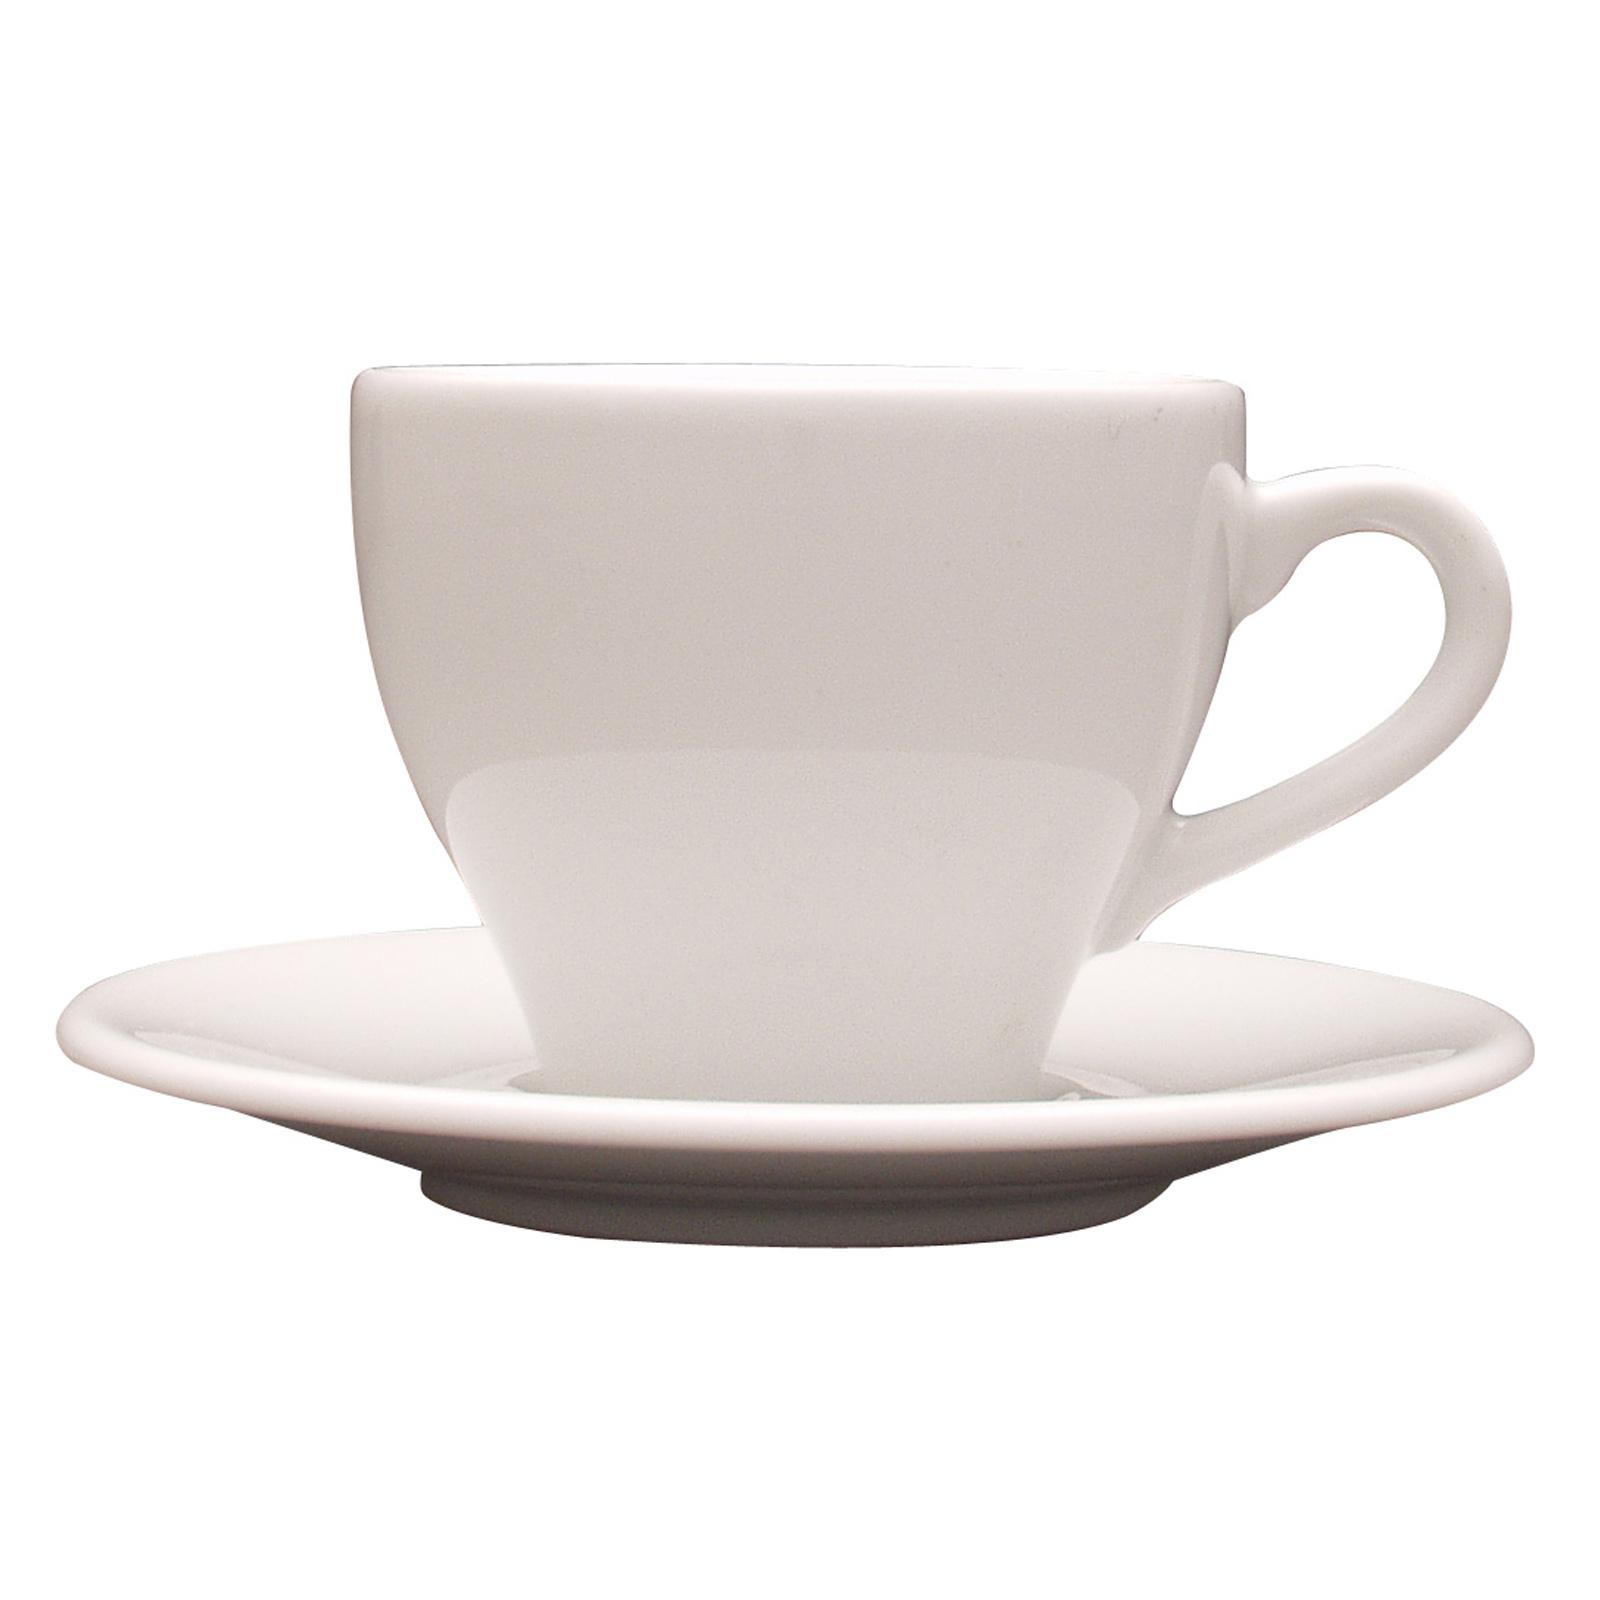 Set of 24 Paula Coffee Cups by Lubiana